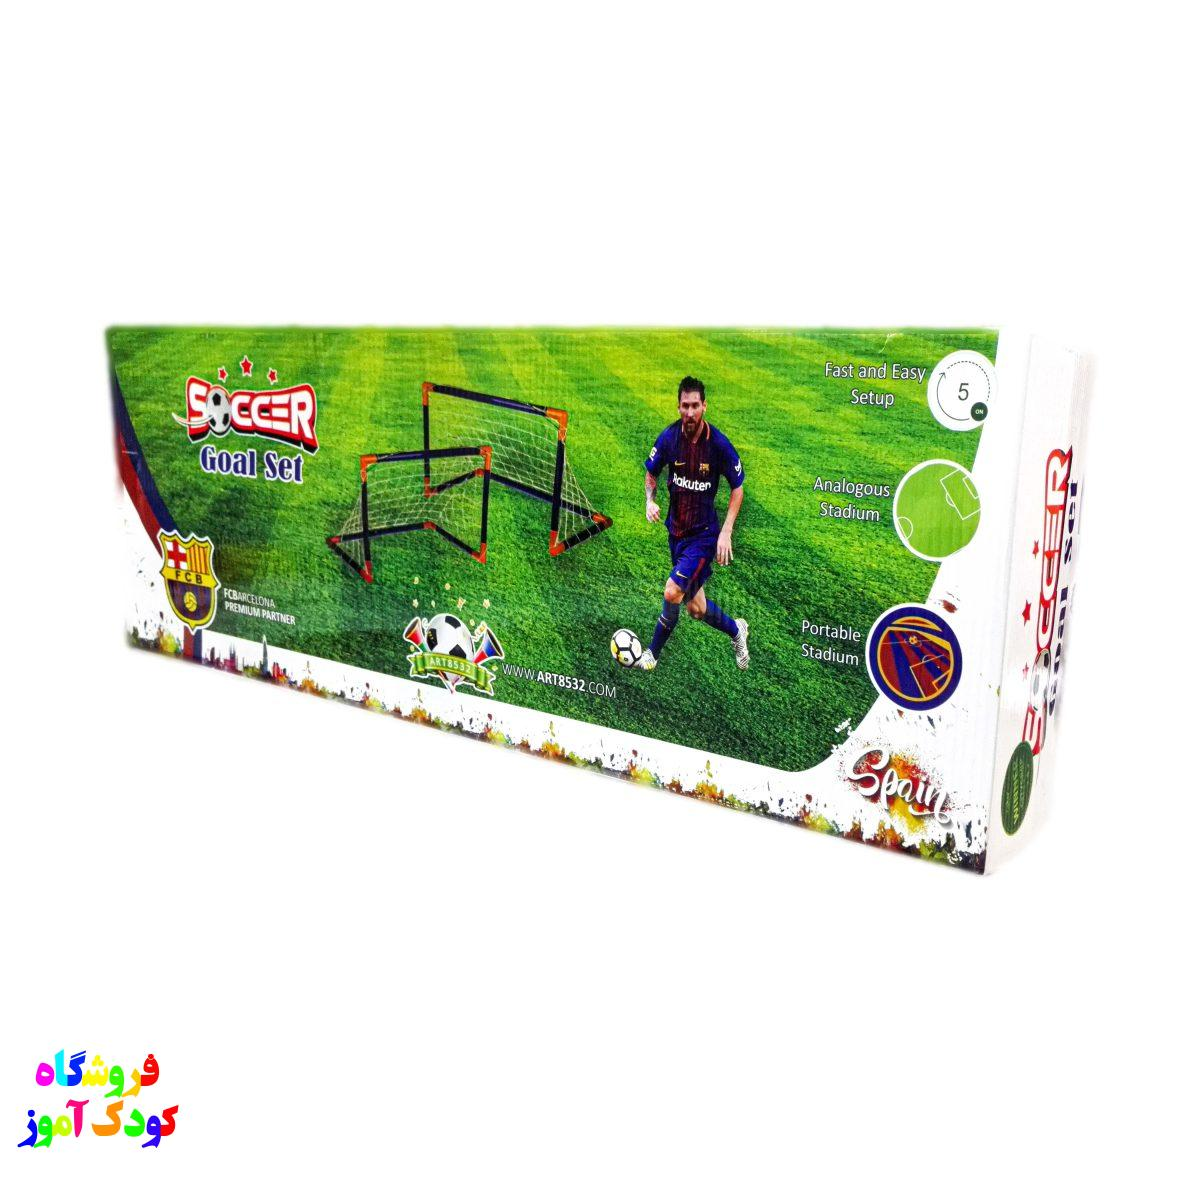 فوتبال 3 1200x1200 - پیشنهاد ویژه